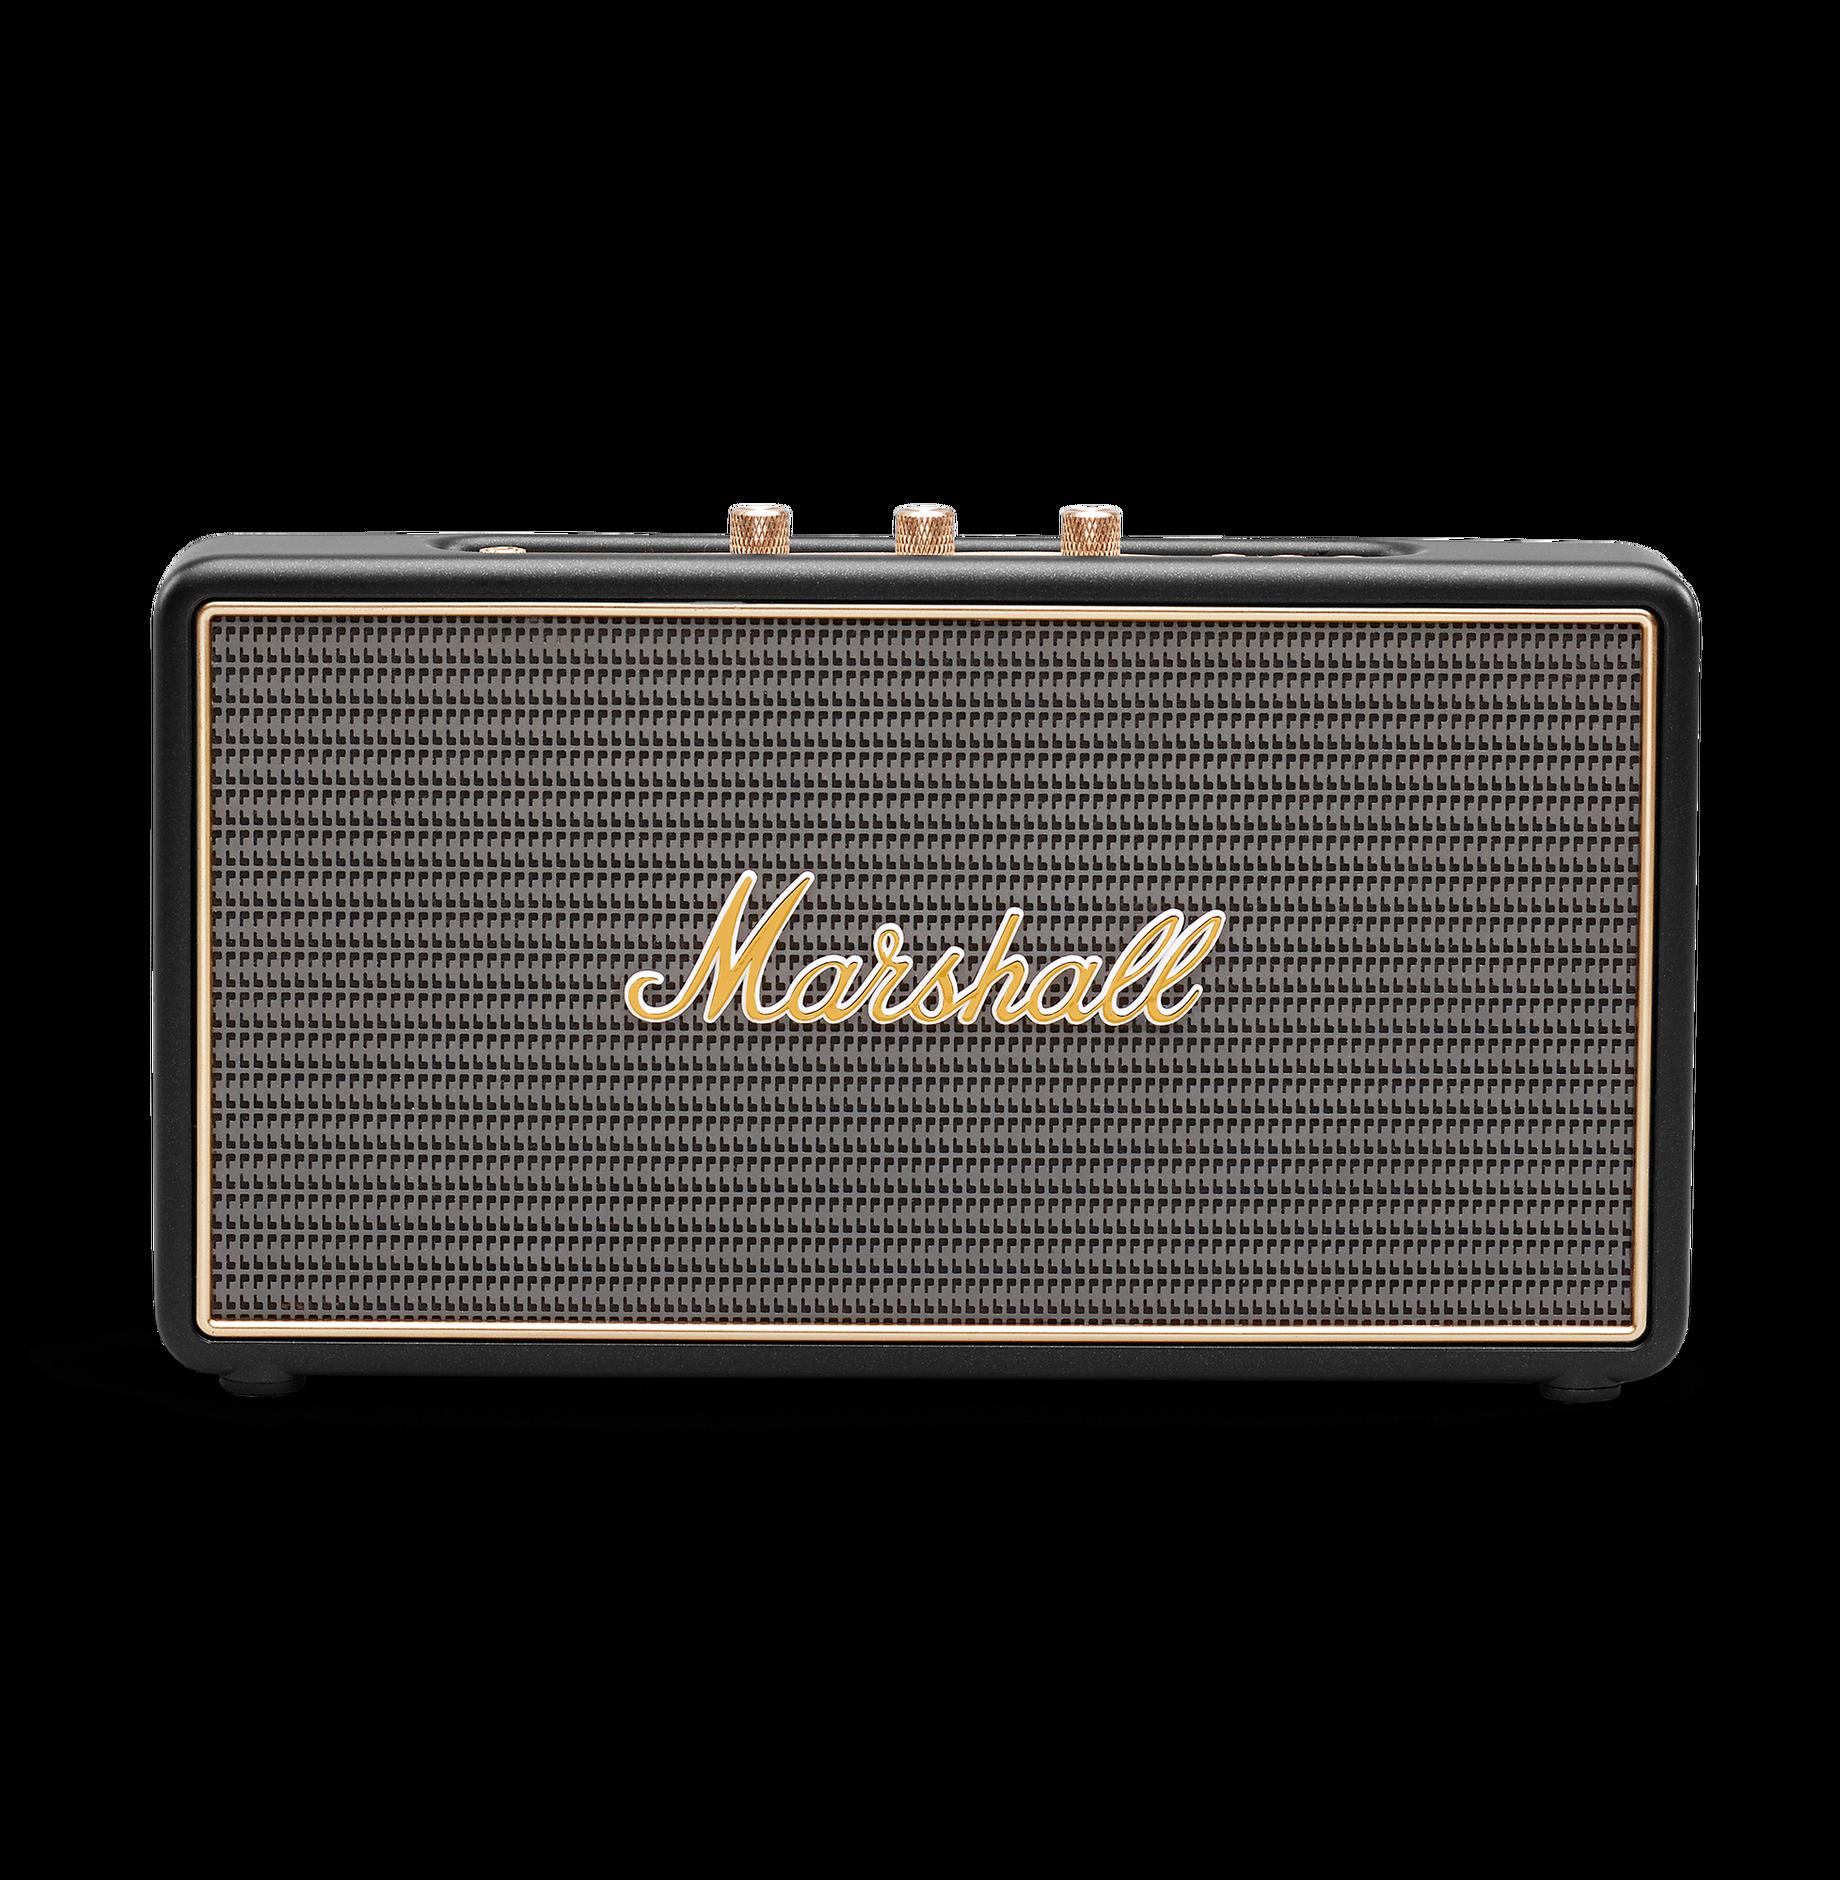 Gold//Black Stockwell Portable Bluetooth Speaker Marshall